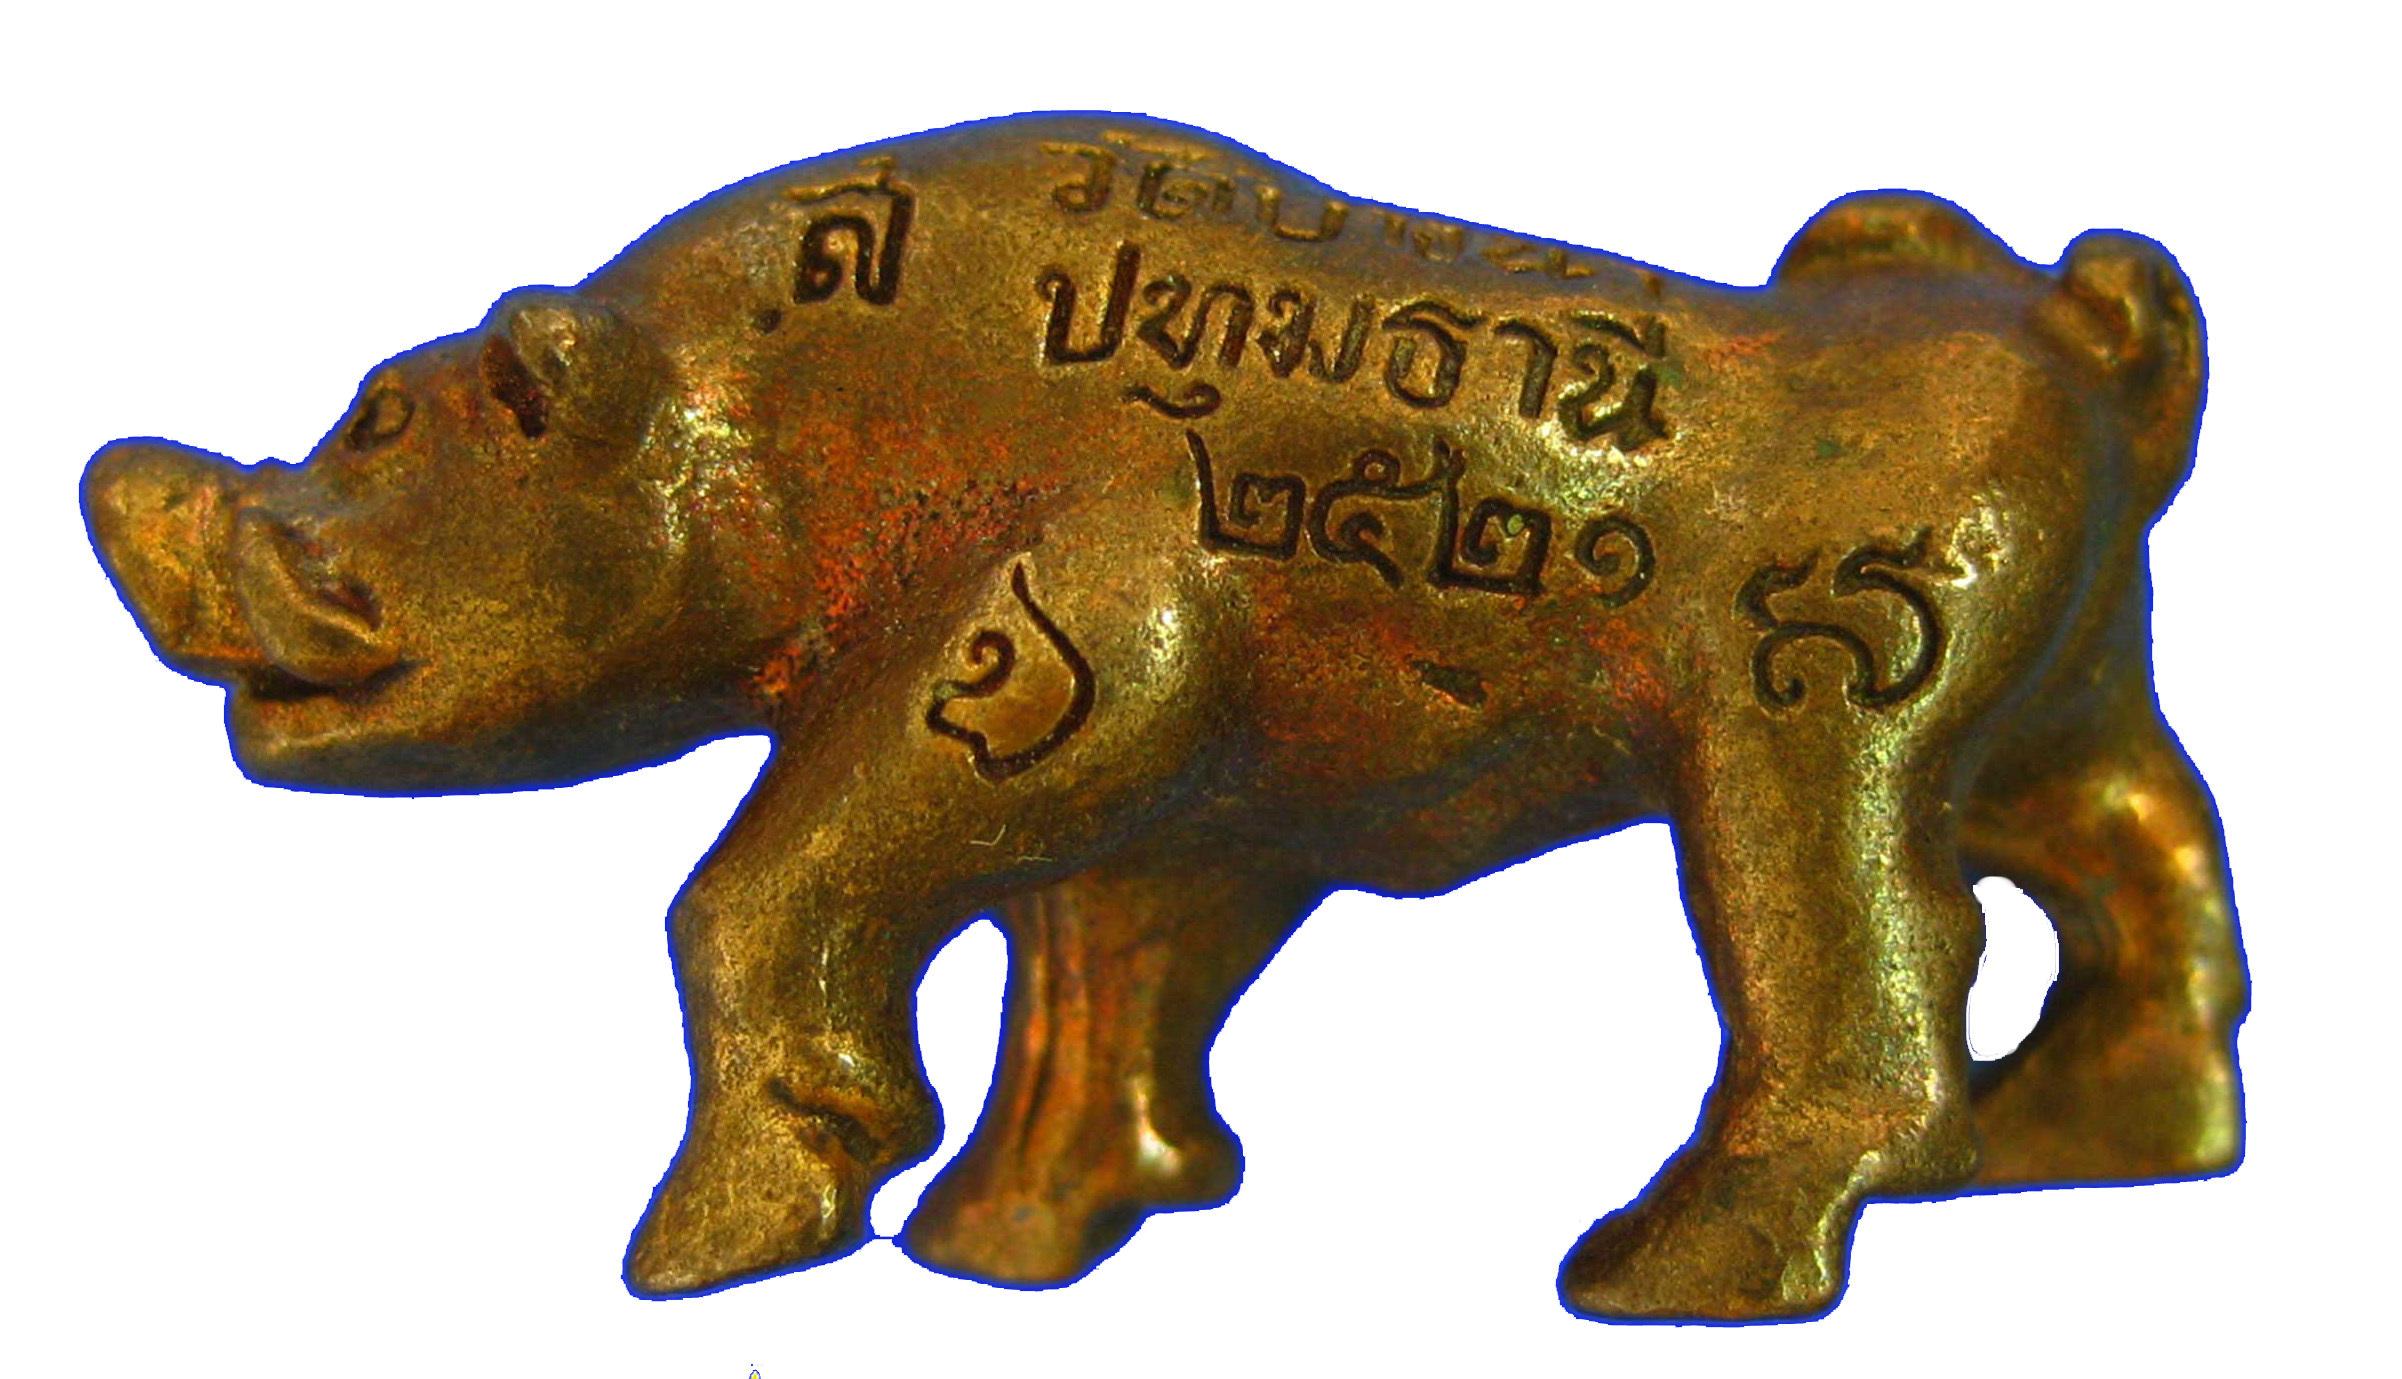 Moo Tong Daen Khiaw Dtan Luang Phu Seng Wat Bang Na